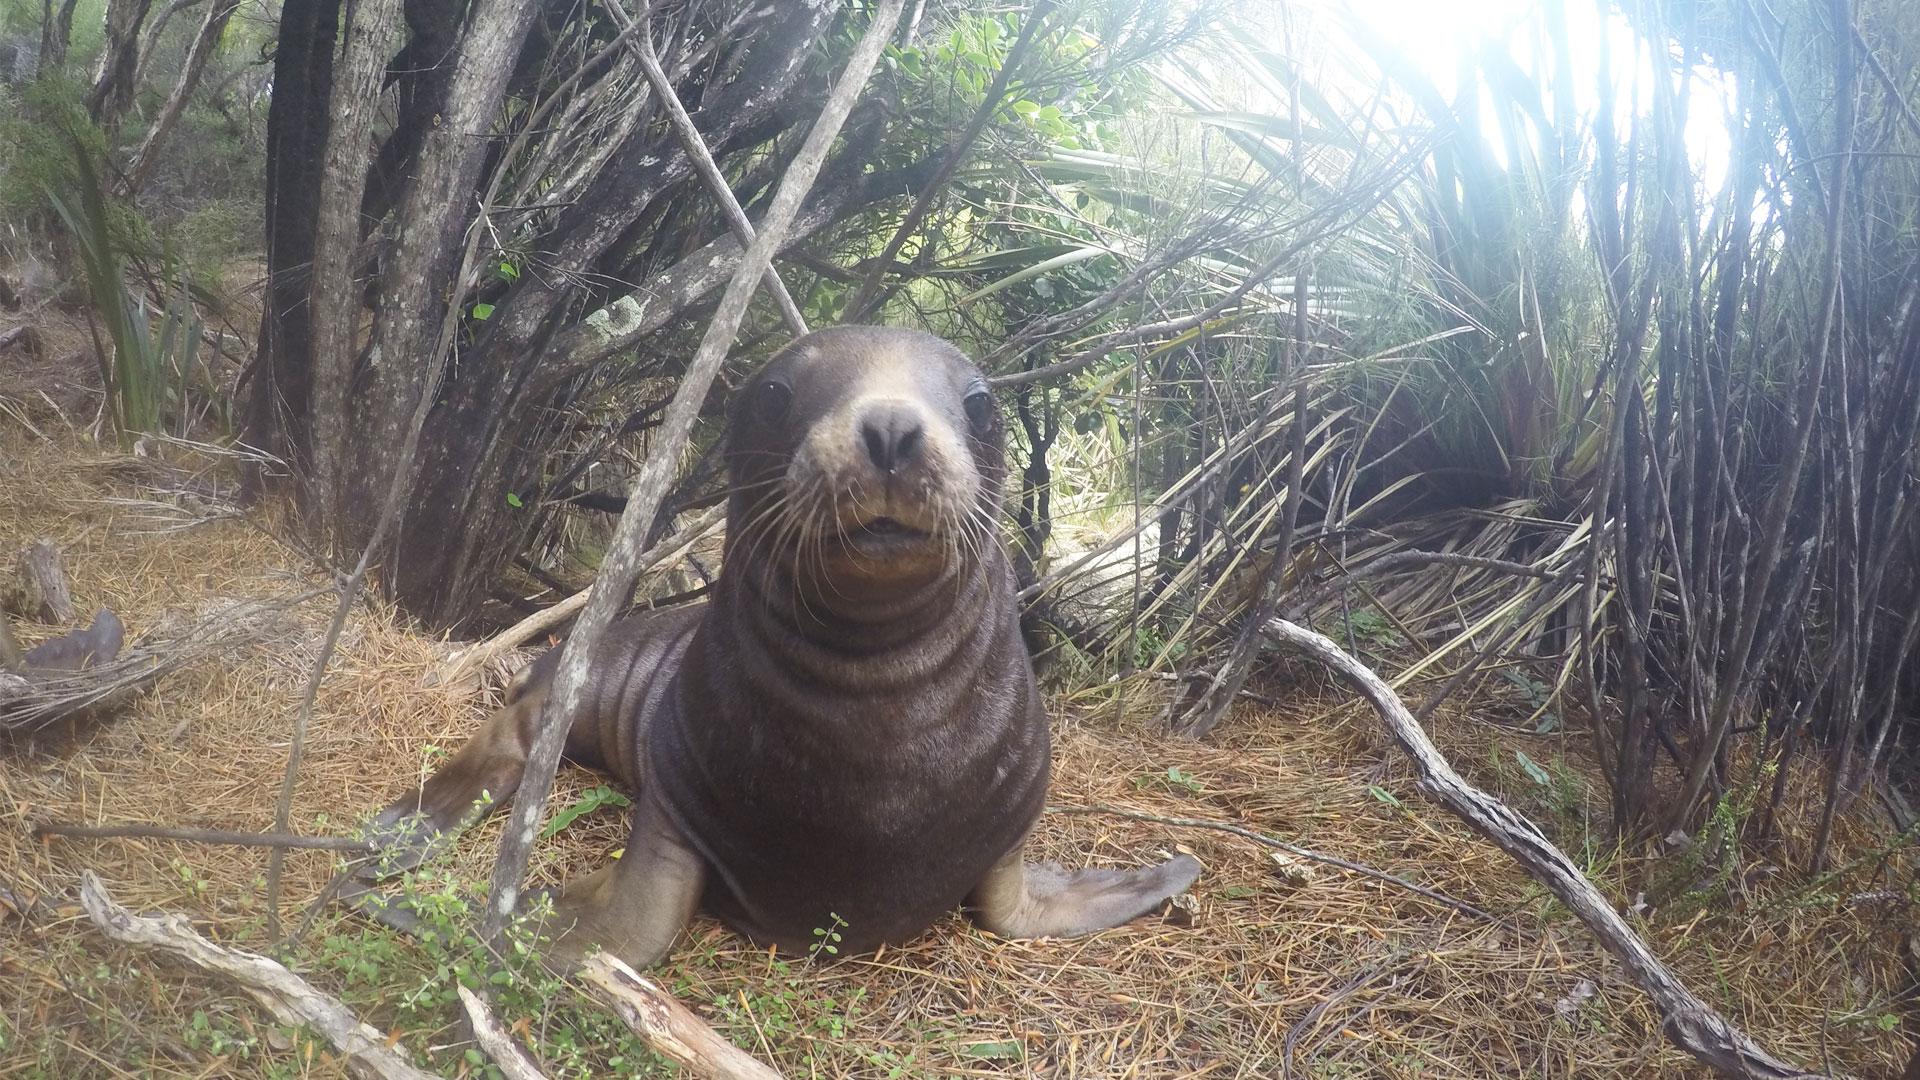 https://rfacdn.nz/zoo/assets/media/sea-lion-conservation-gallery-1.jpg